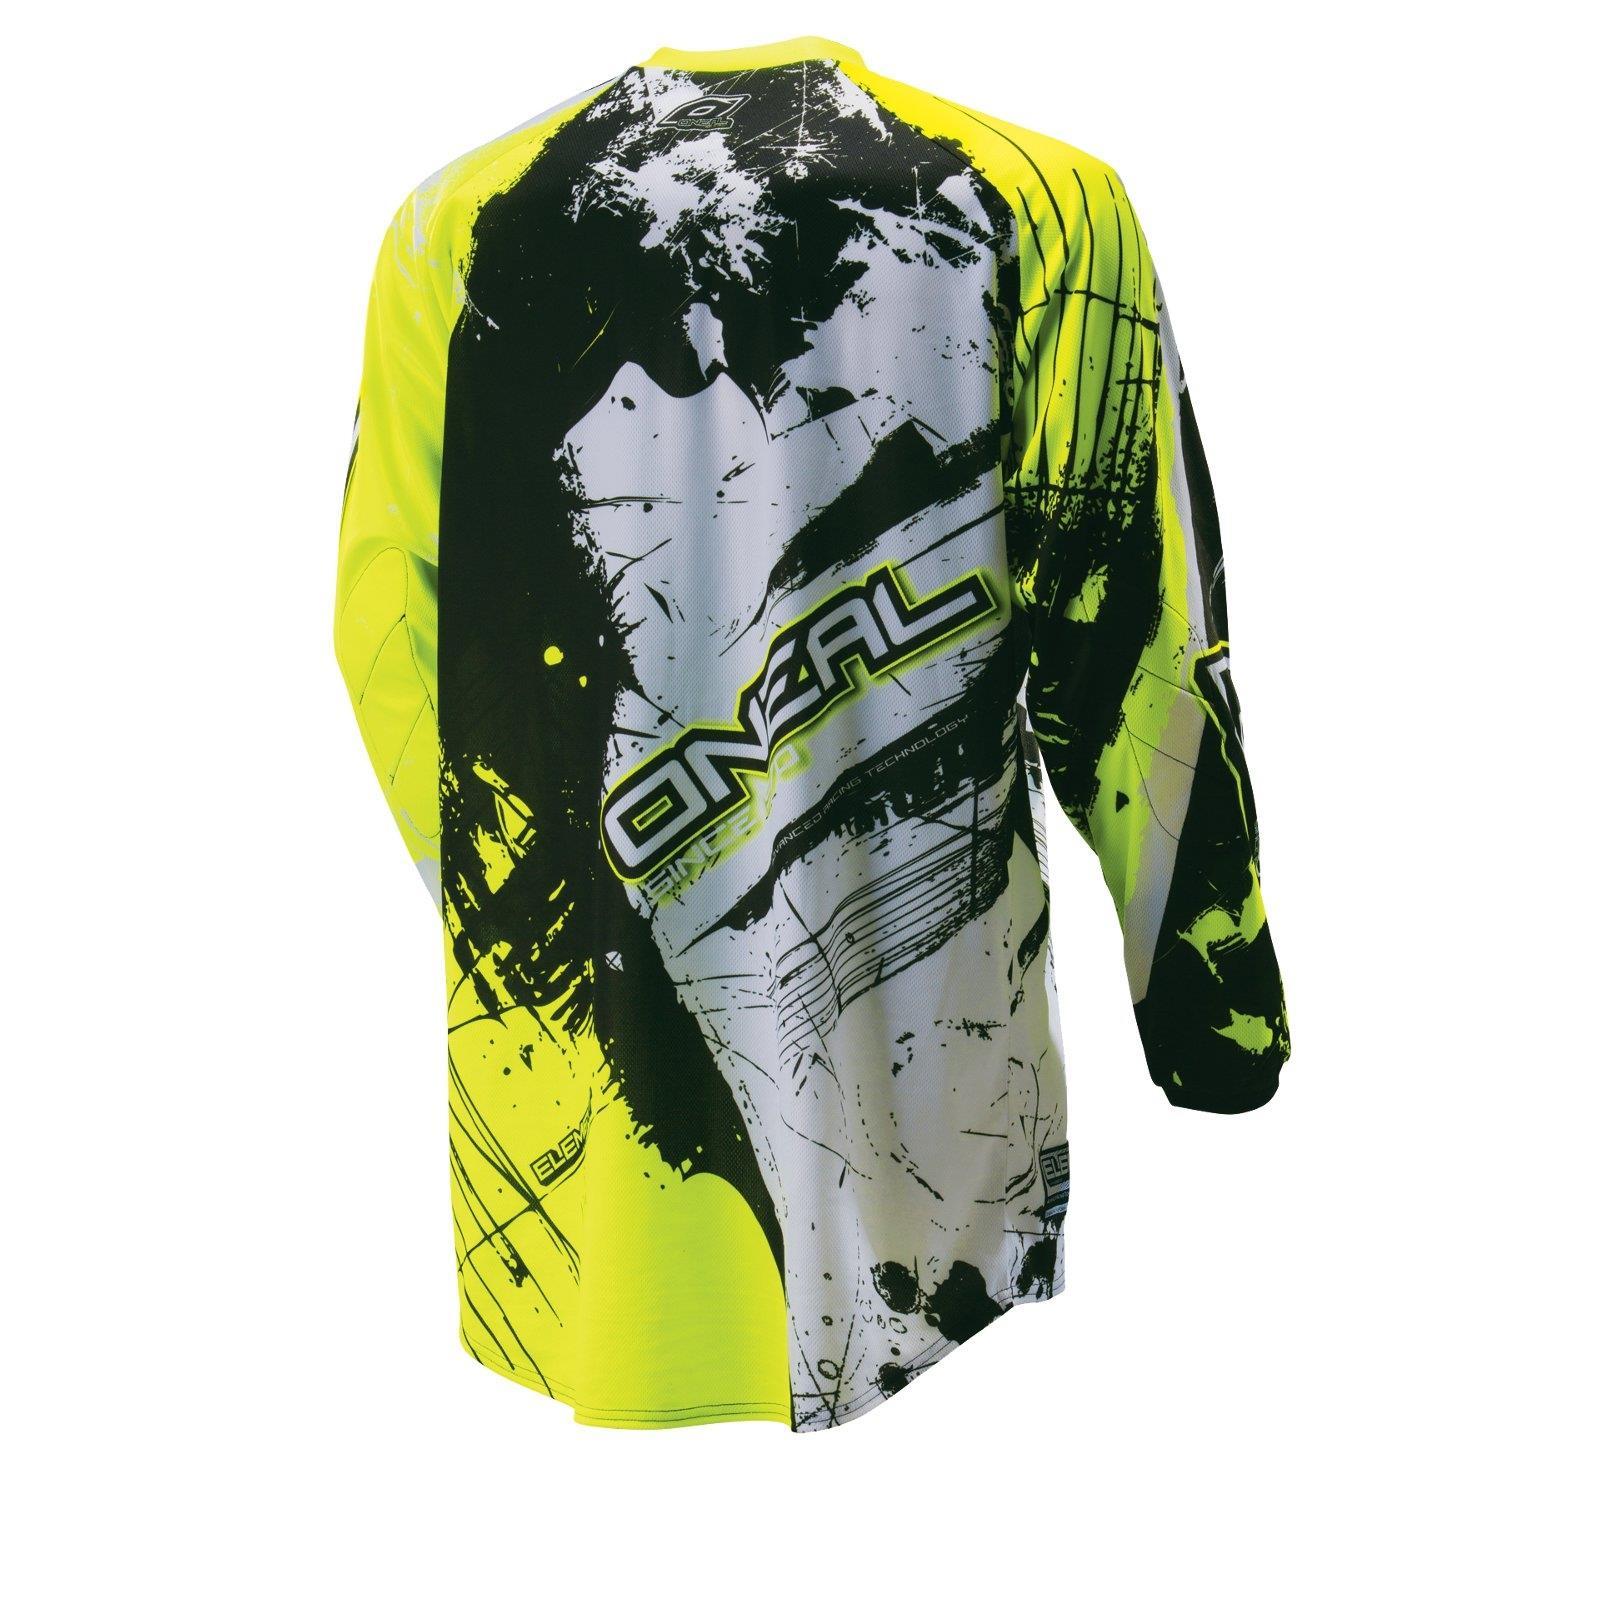 ONeal-pantalones-de-Jersey-de-los-ninos-de-pantalones-cortos-ninos-MX-bicicleta-DH-montana-bicicleta miniatura 67